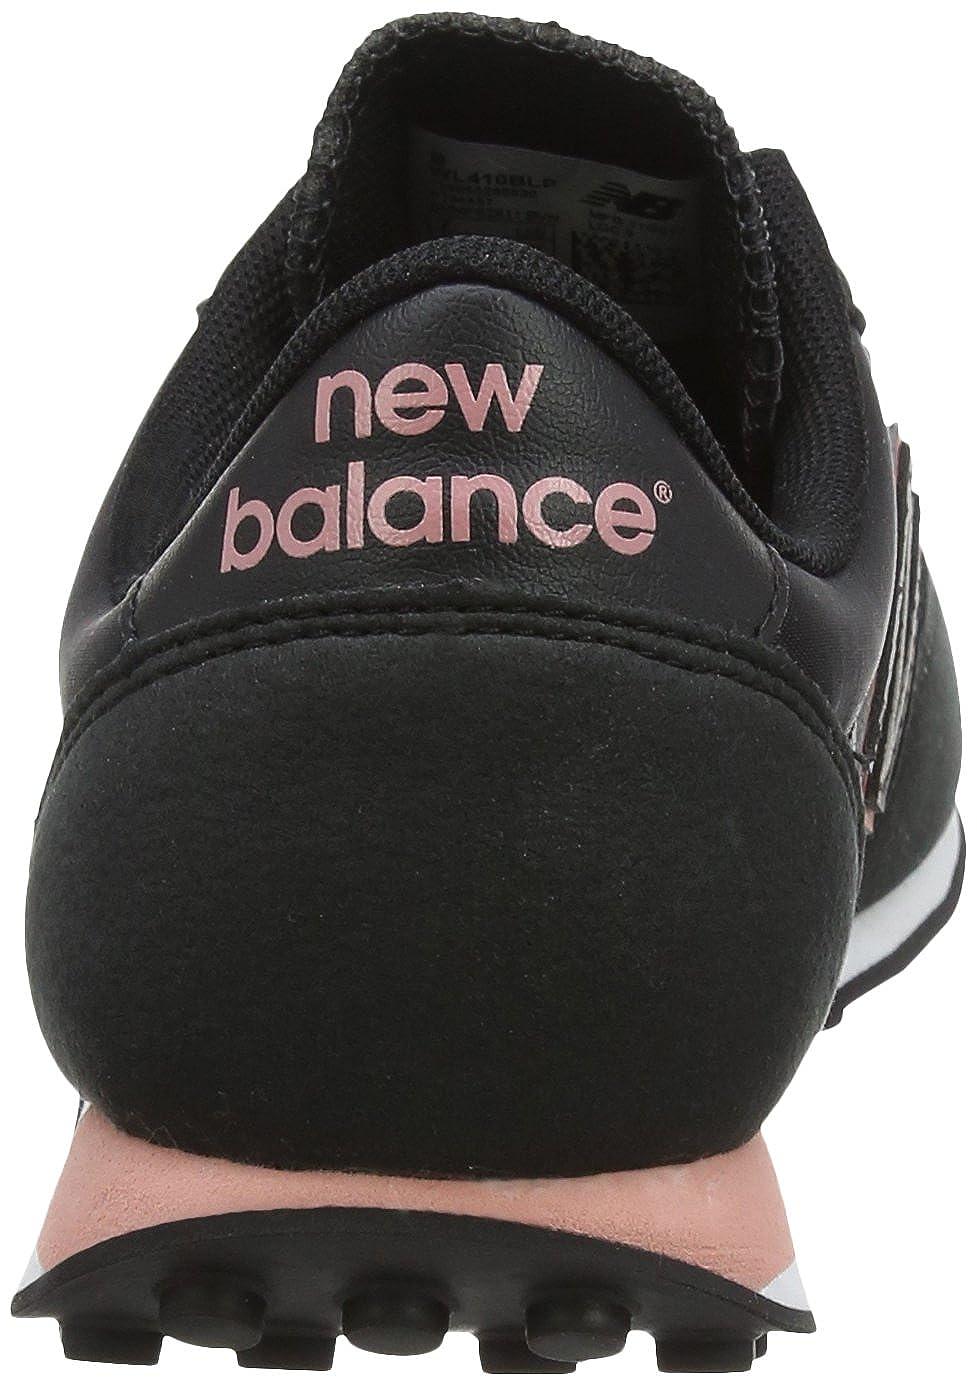 New New New Balance Damen 410 Turnschuhe grau 36 EU  c069f0